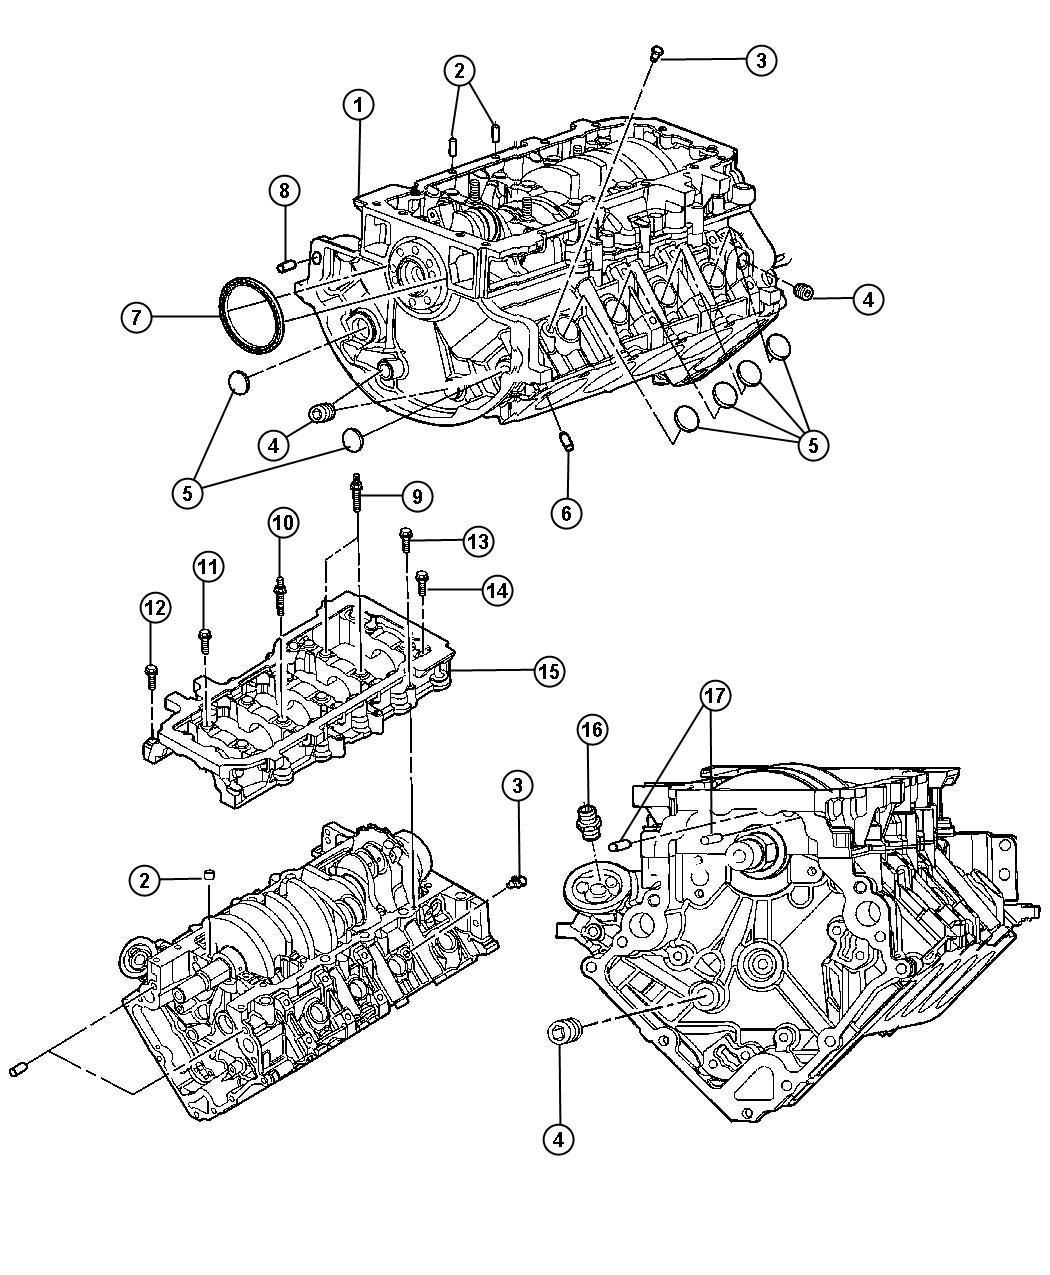 Engine Block Cores